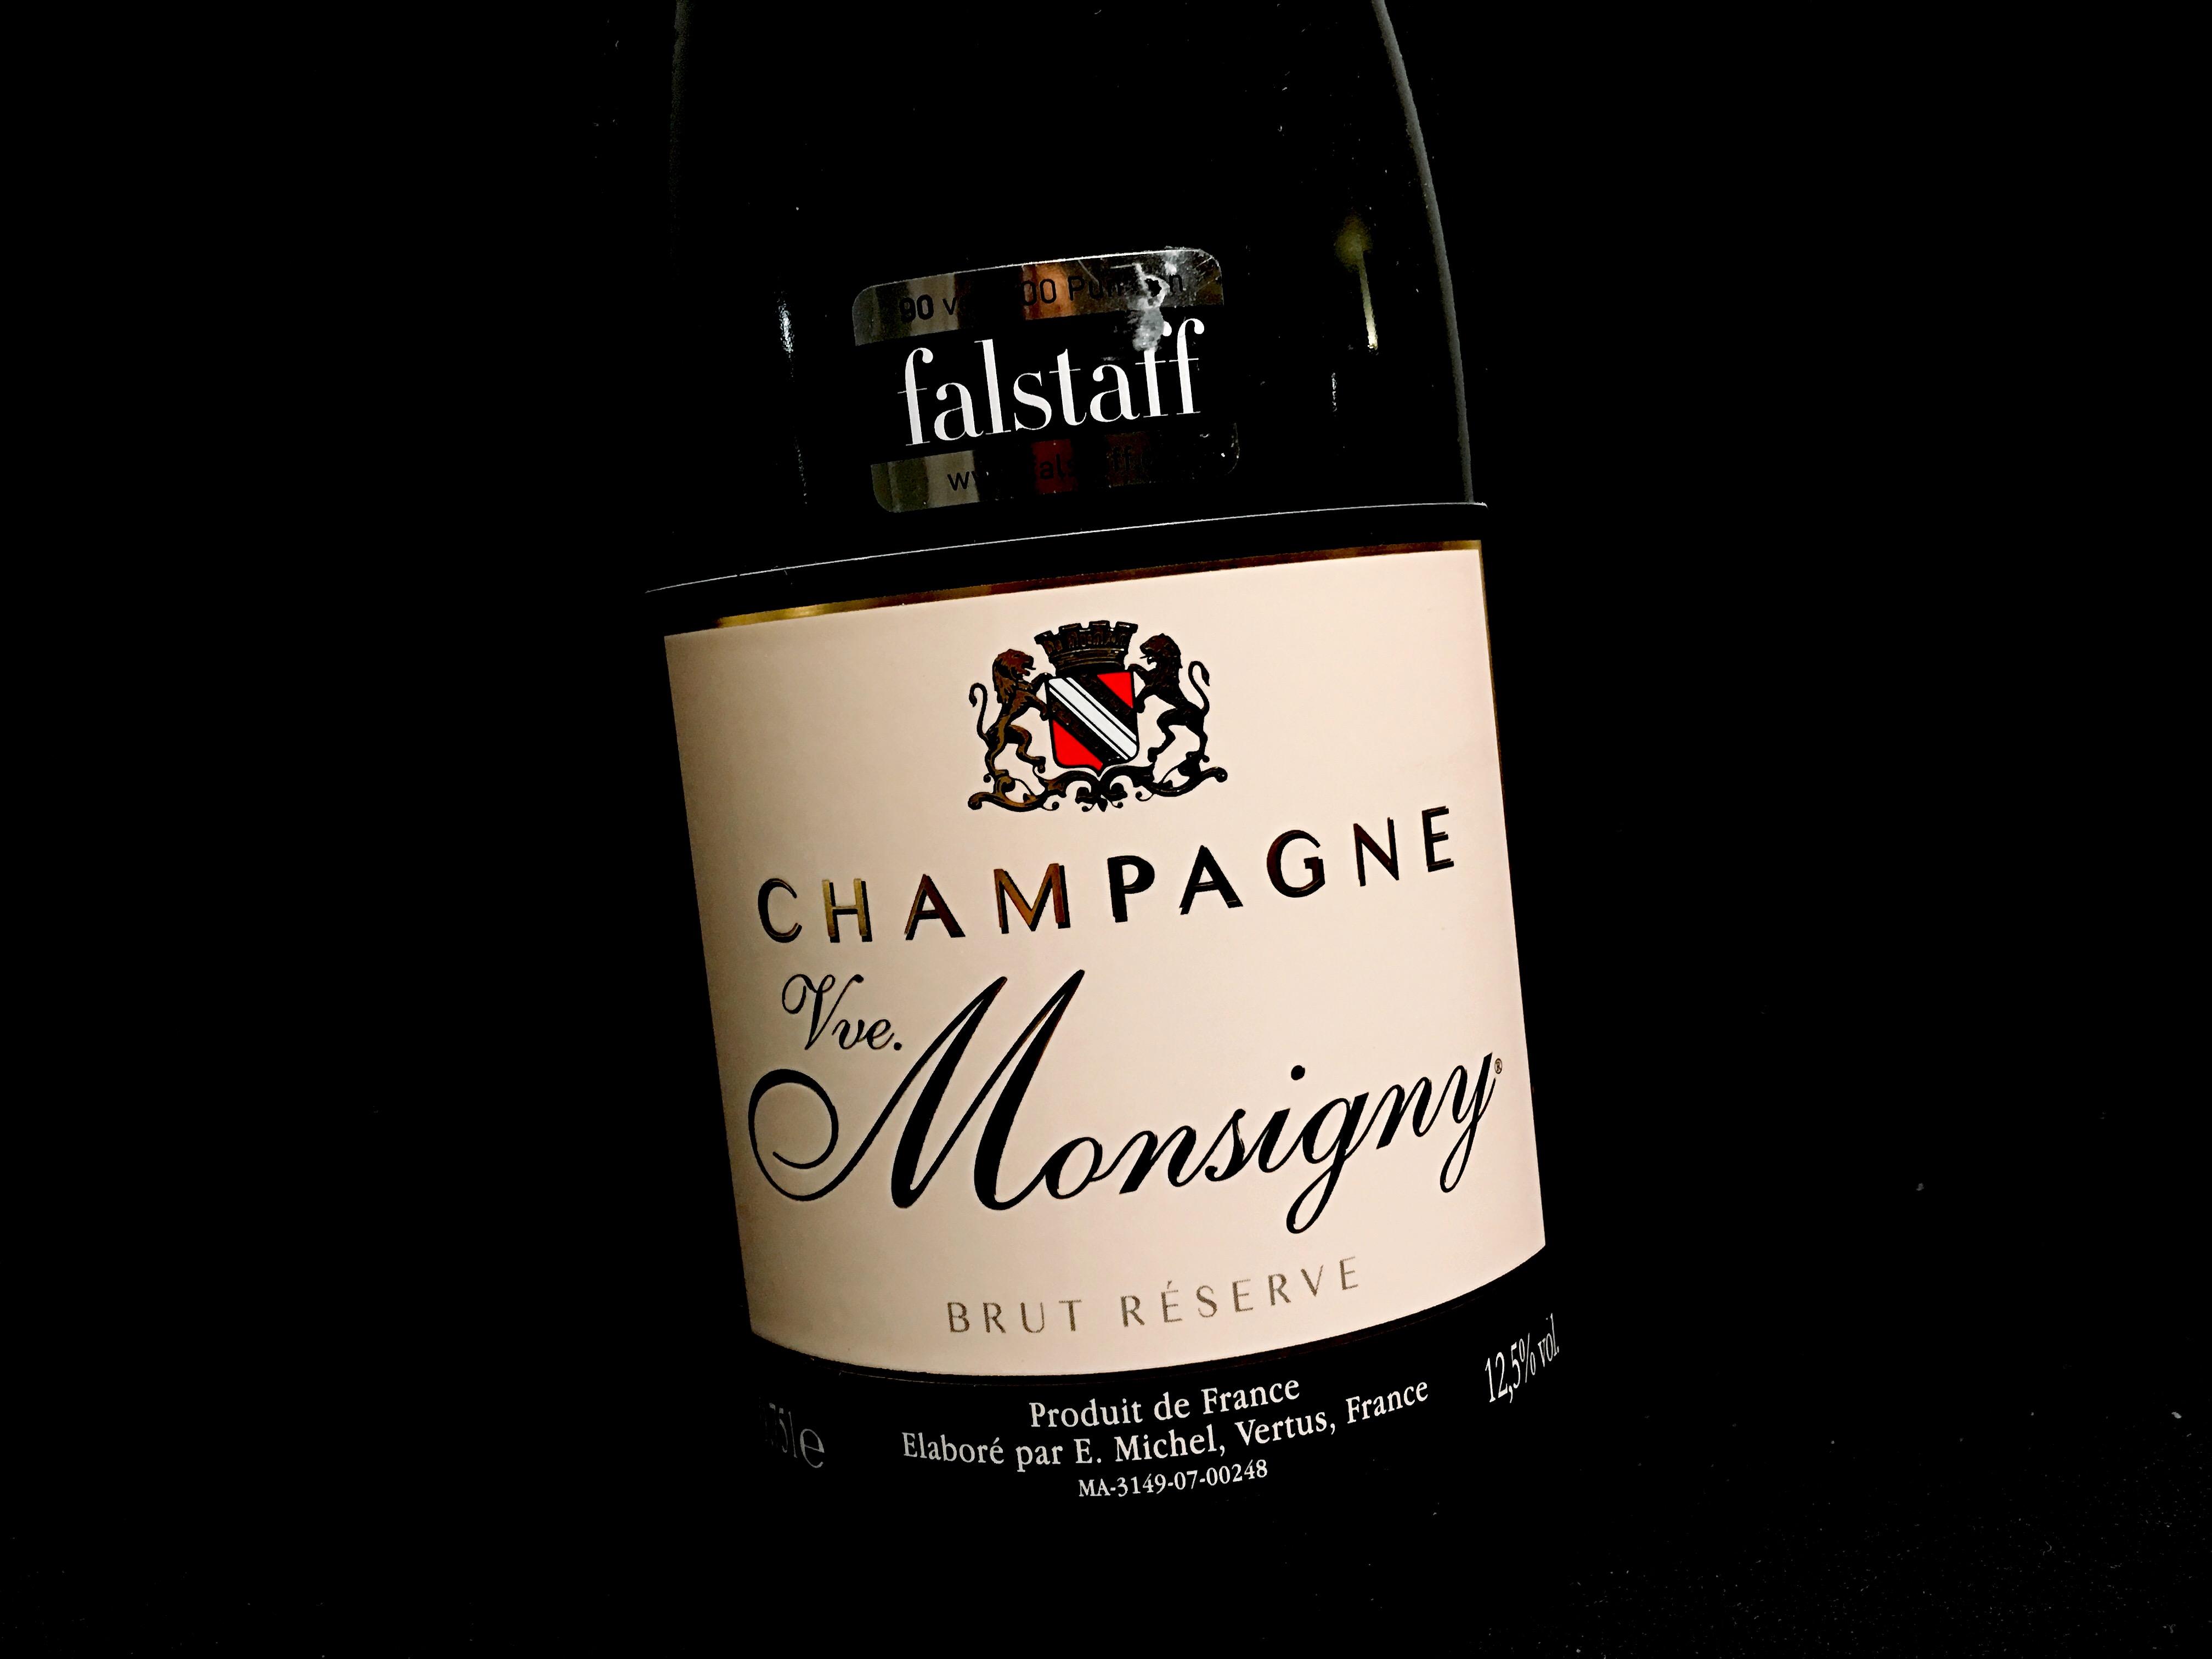 Champagner Veuve Monsigny Brut Etikett vorne